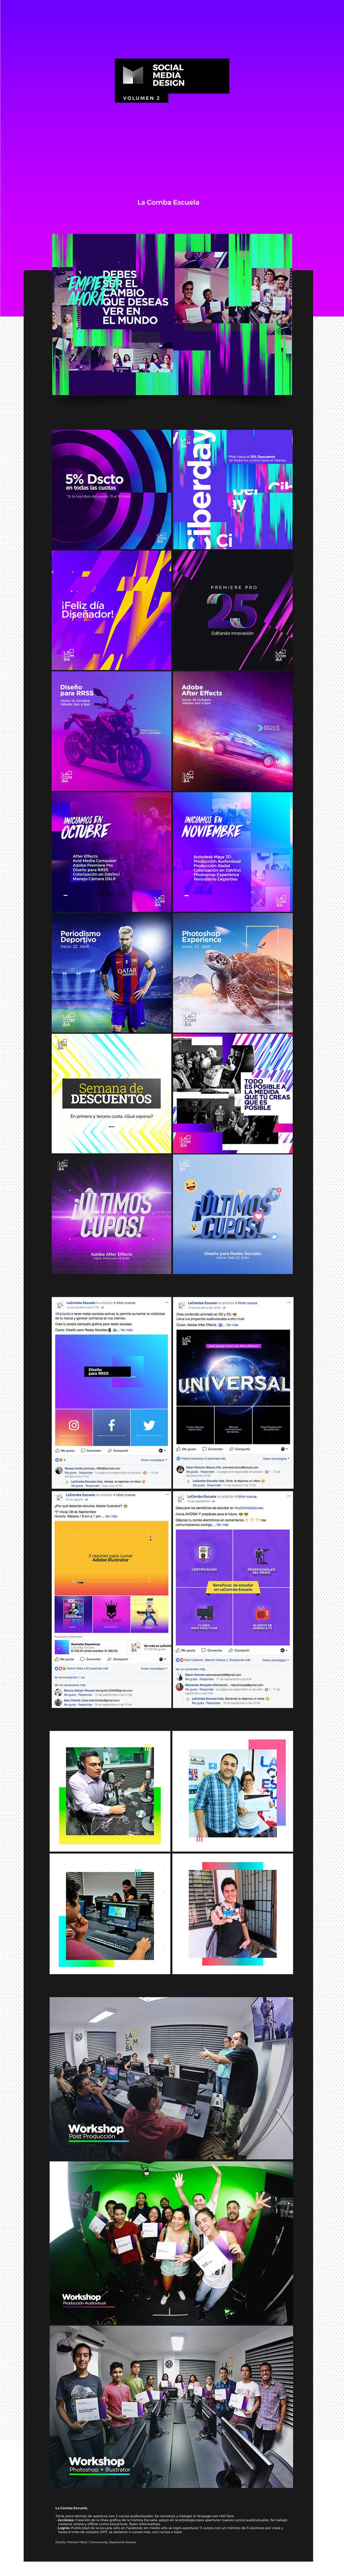 Social Media Design Vol 2 0